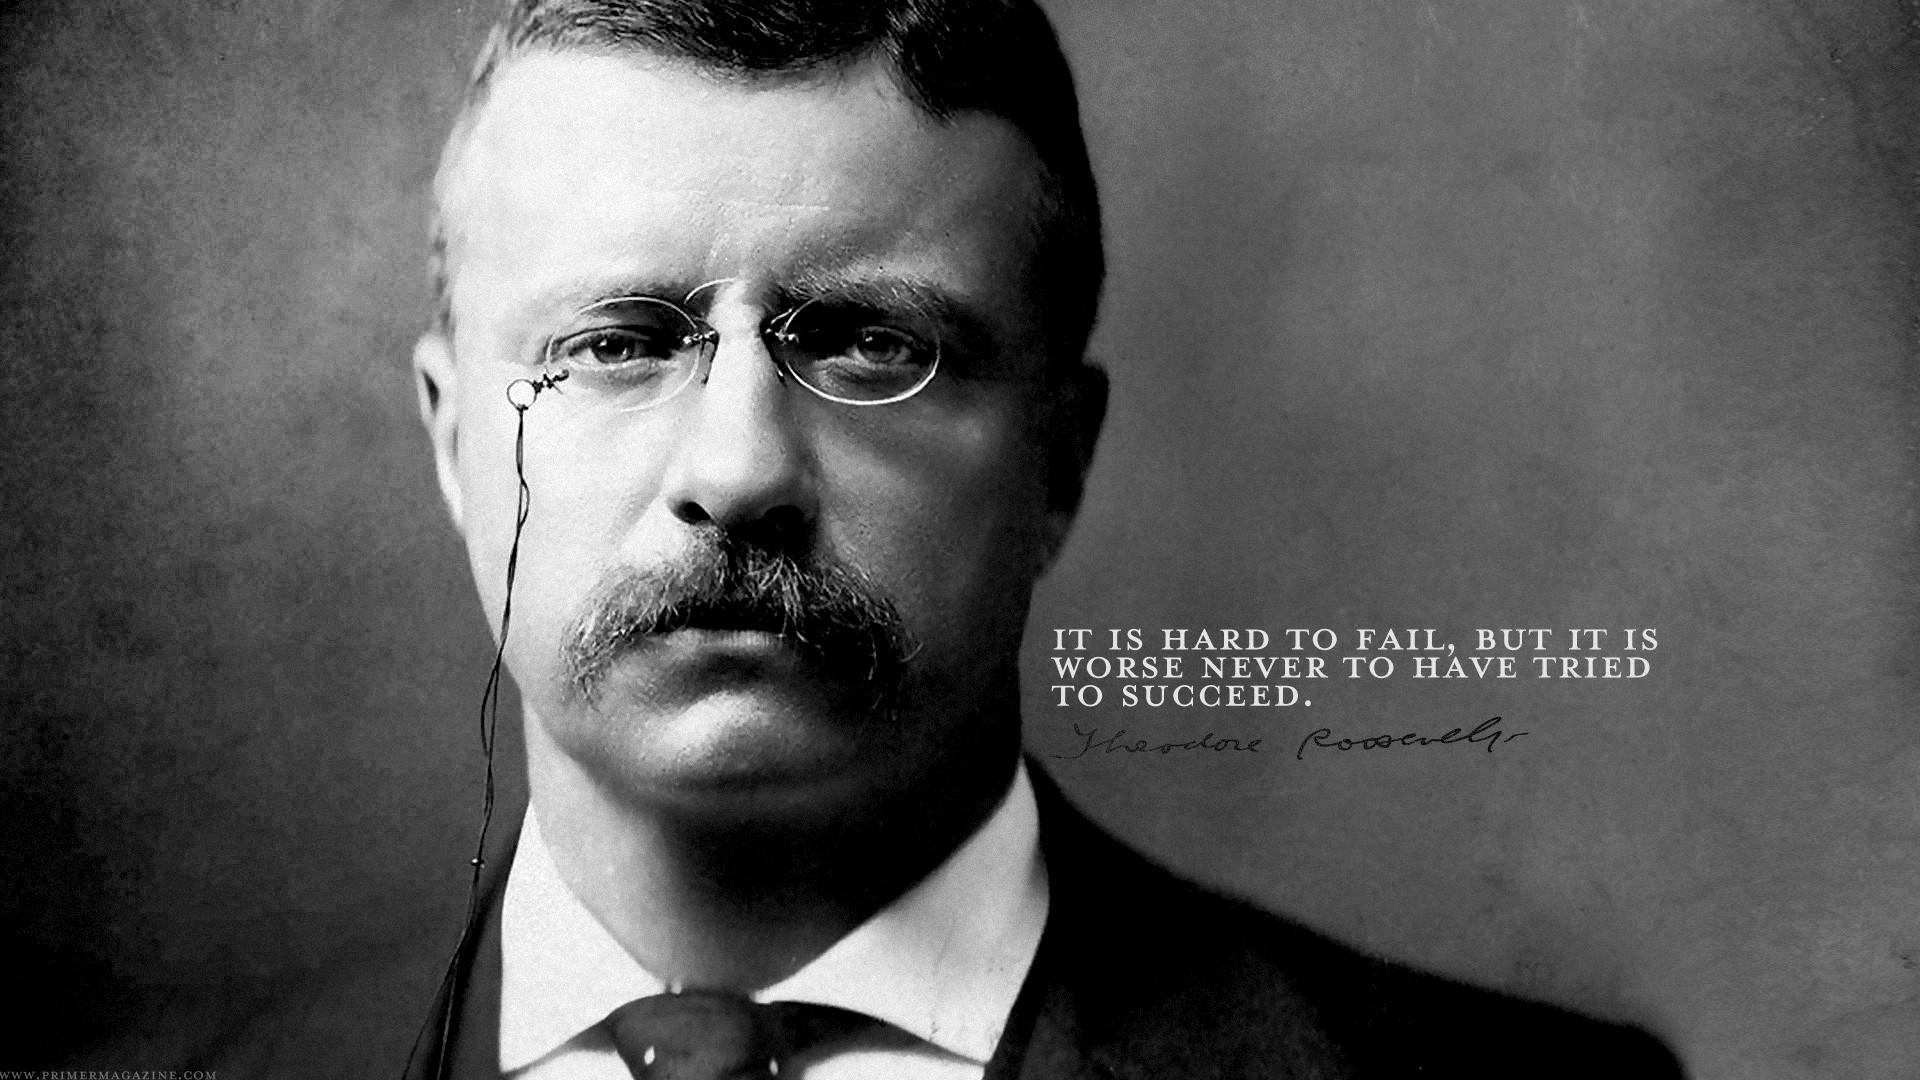 Theodore Roosevelt; Theodore Roosevelt; Theodore Roosevelt; Theodore Roosevelt ...